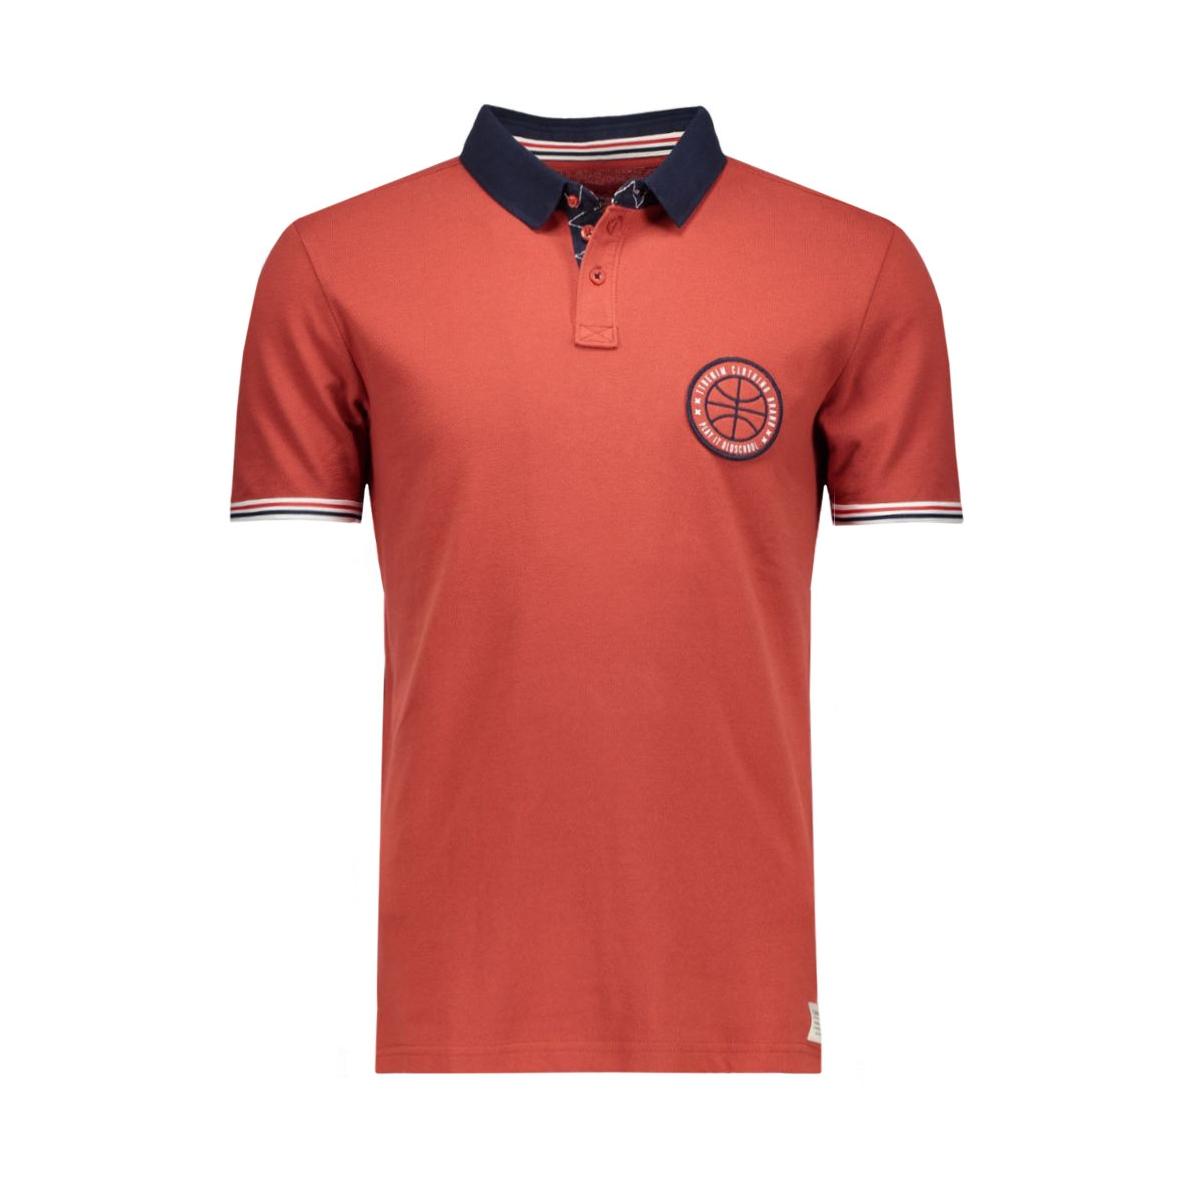 1530982.00.12 tom tailor polo 4681